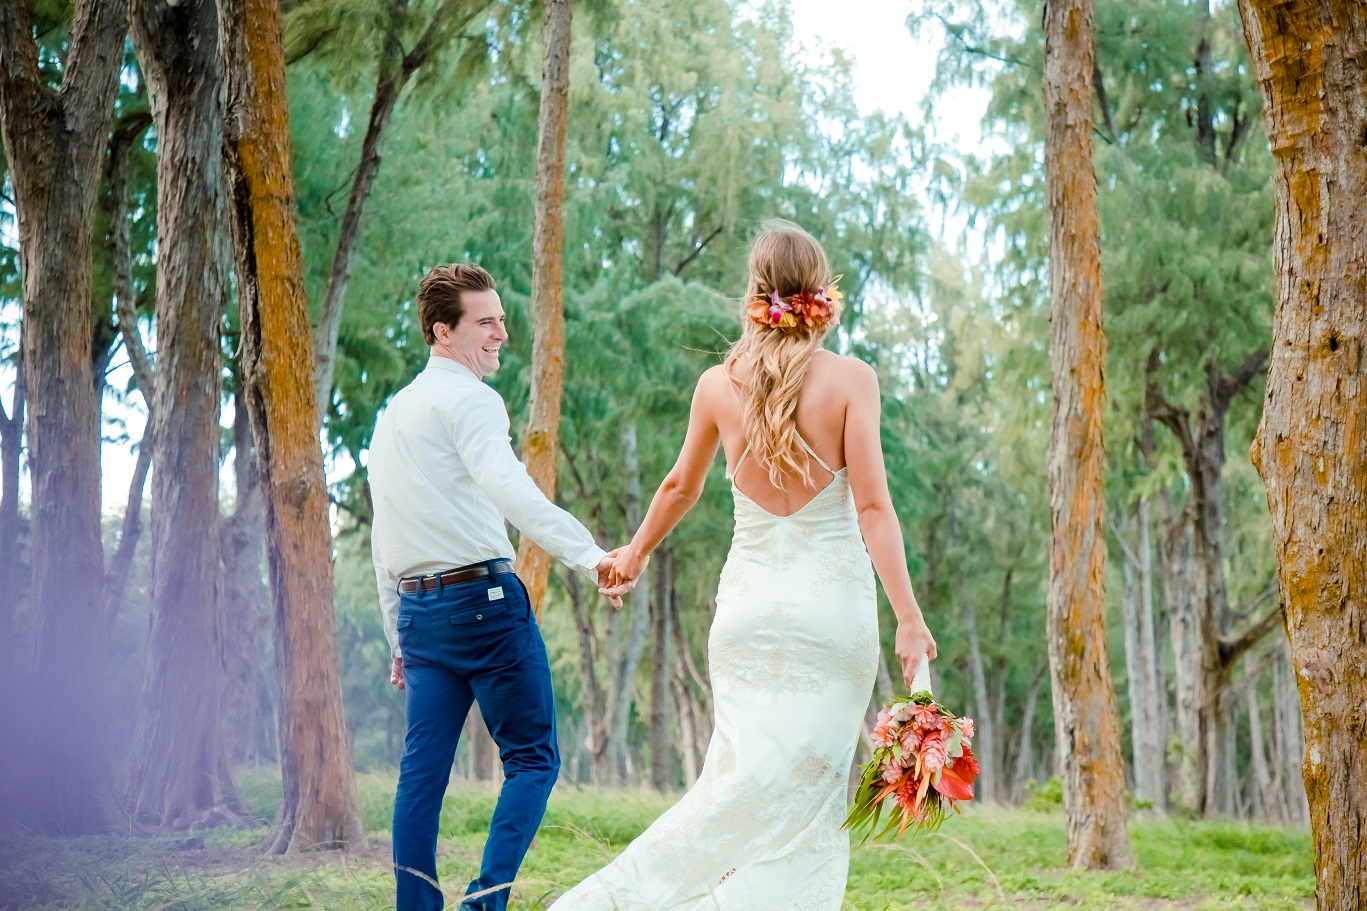 bride and groom walking in forest hawaii destination wedding